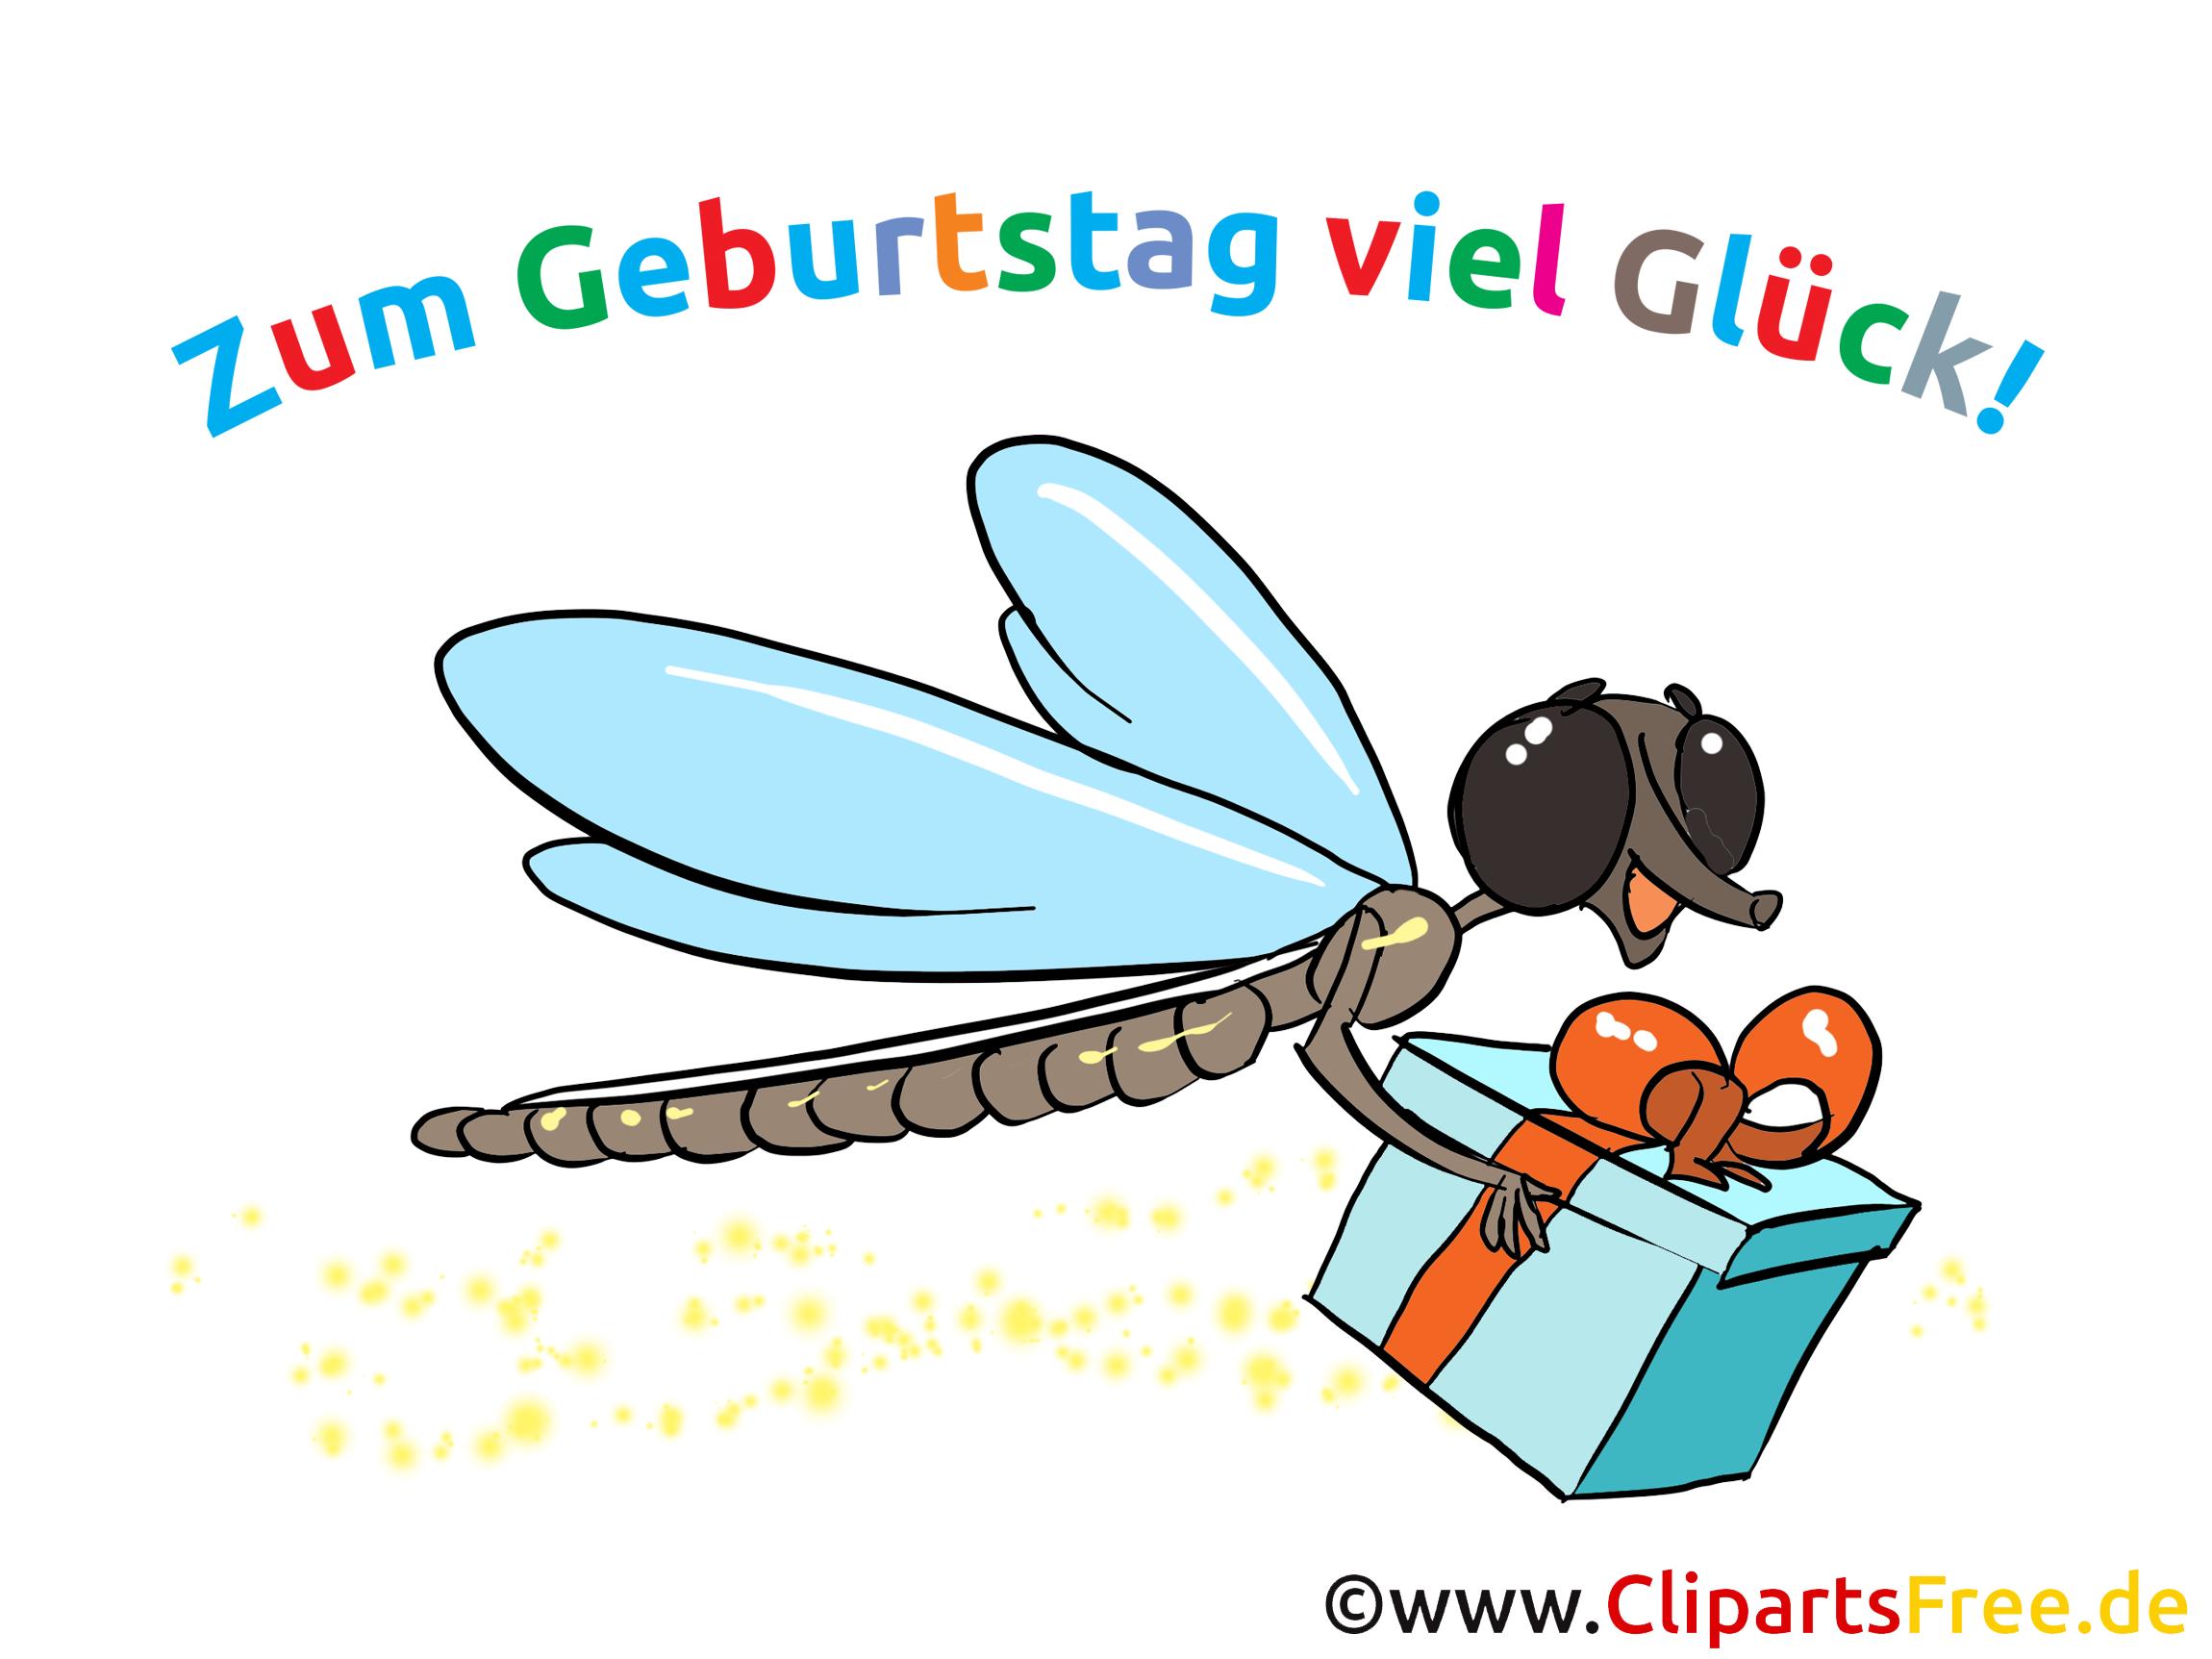 Cliparts Geburtstag lustig